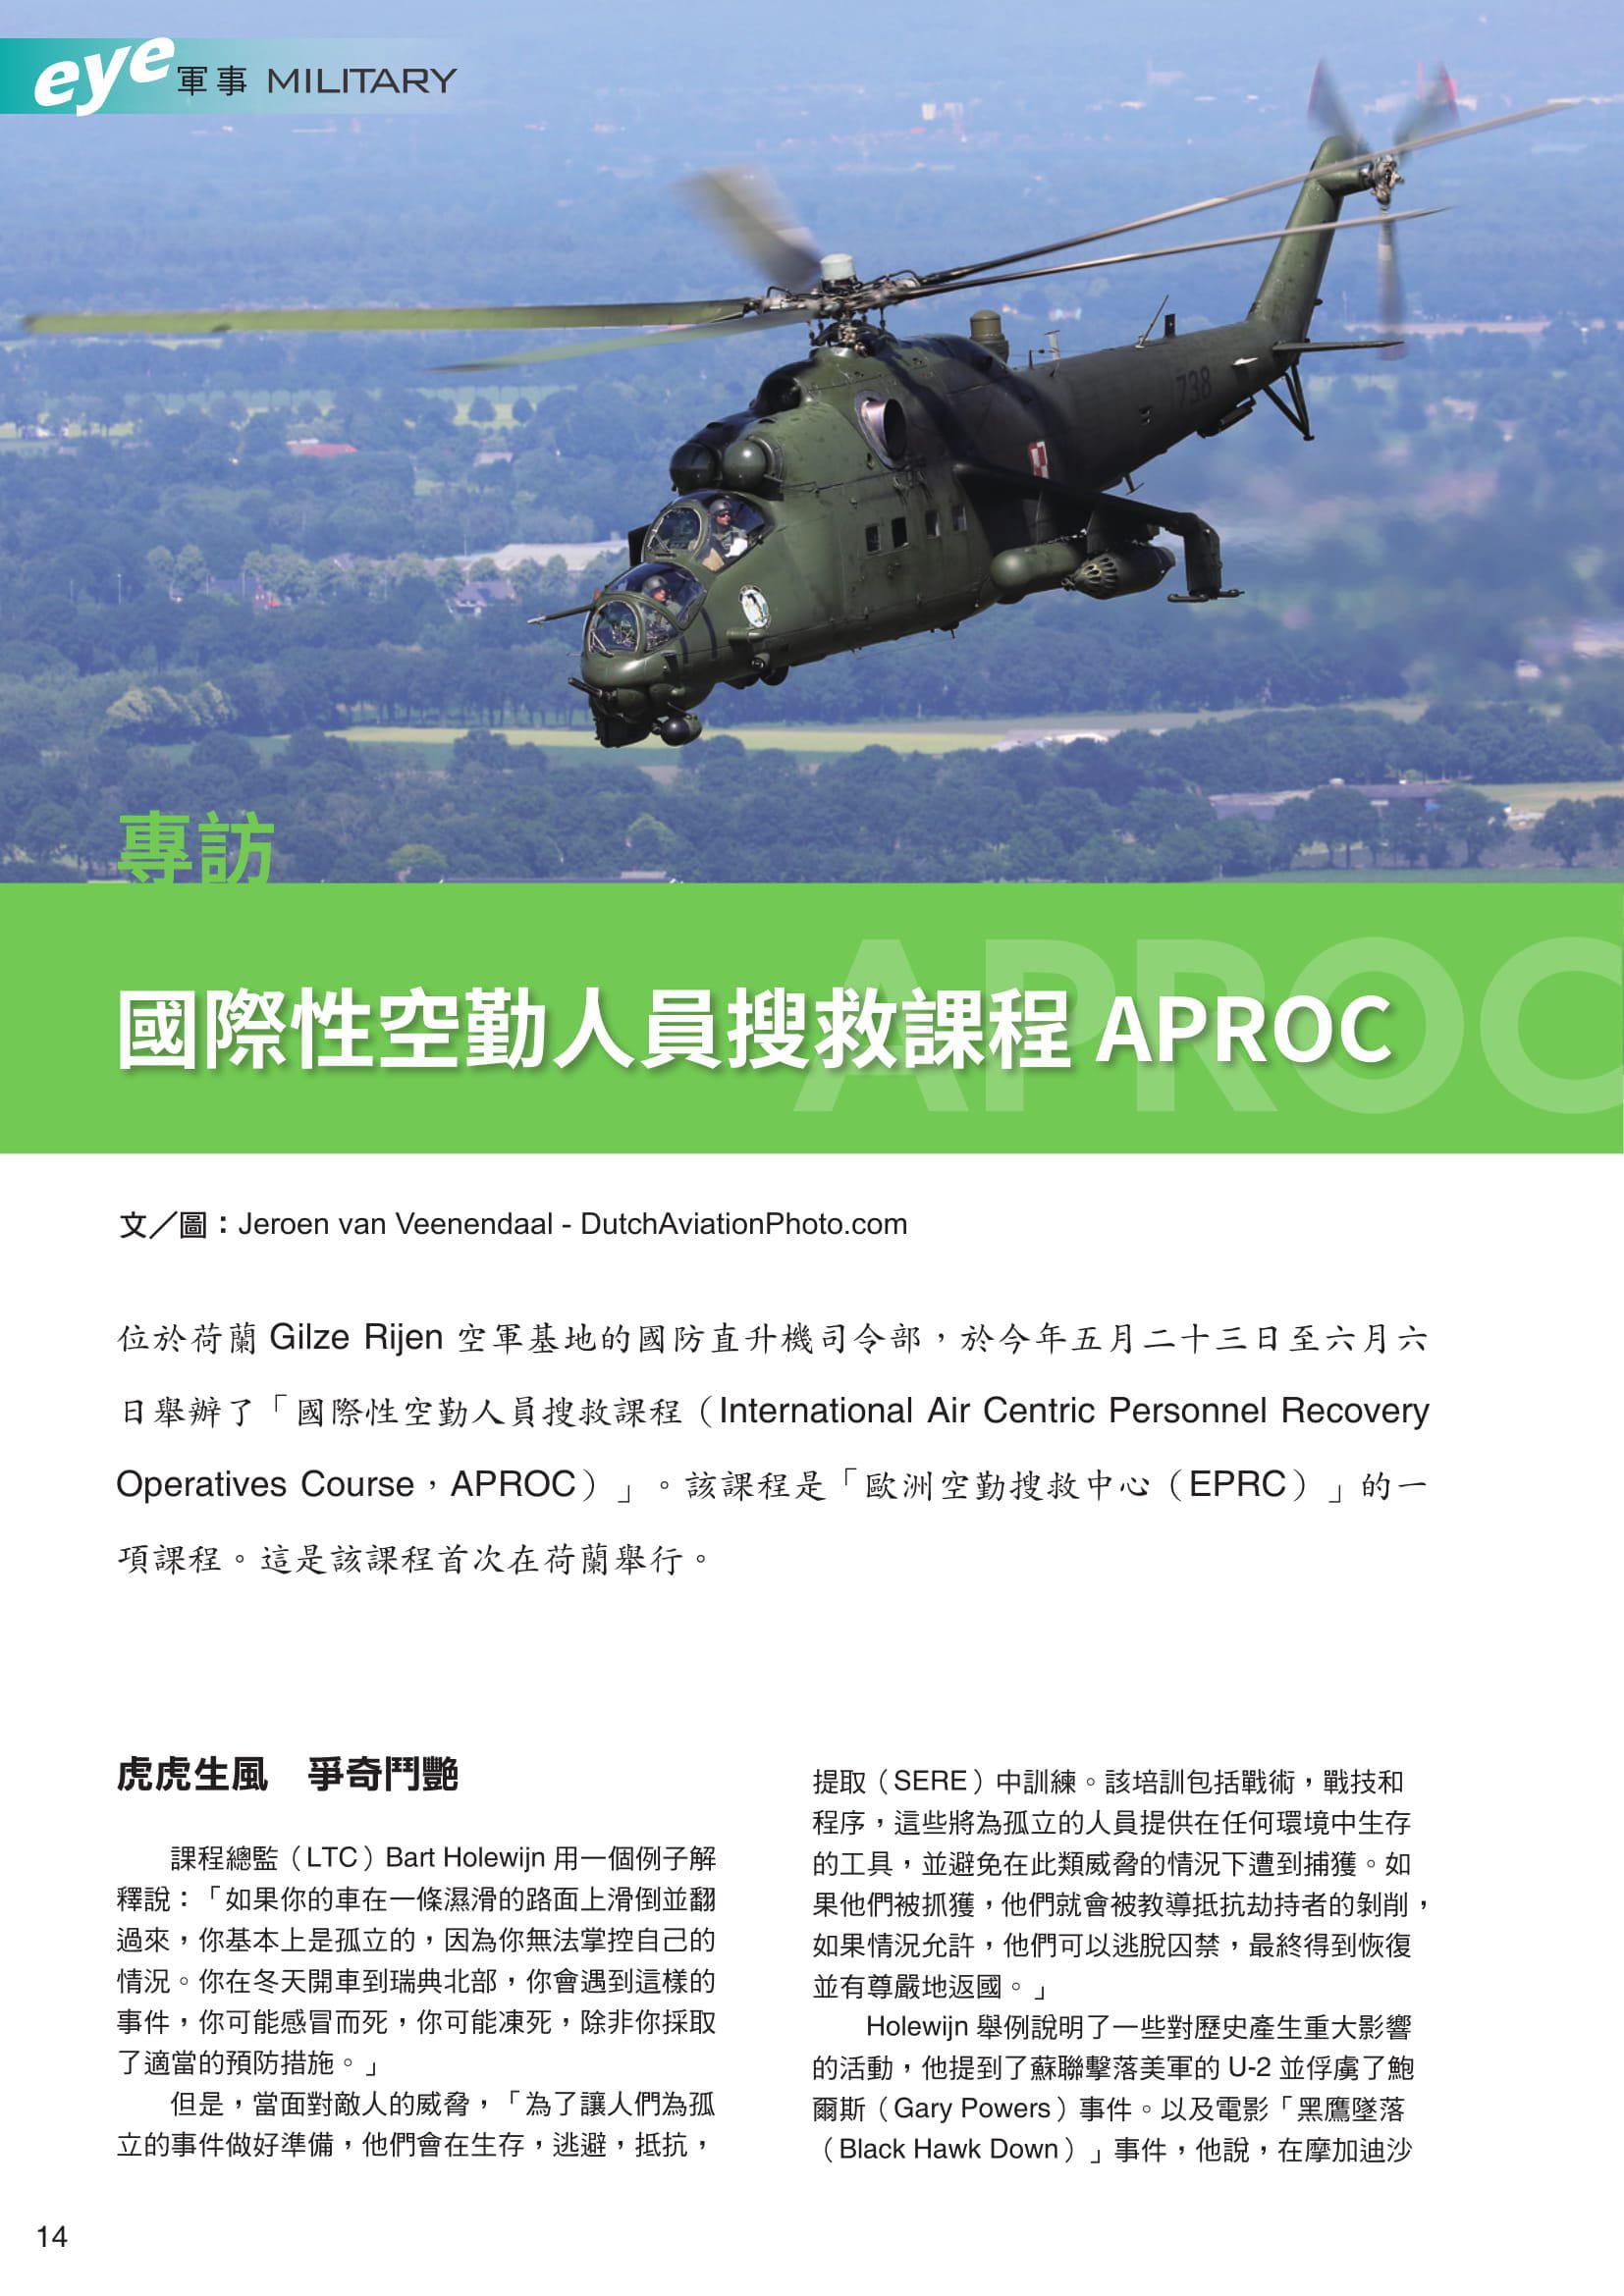 Defense Shutter (Taiwan)_APROC 2018-2